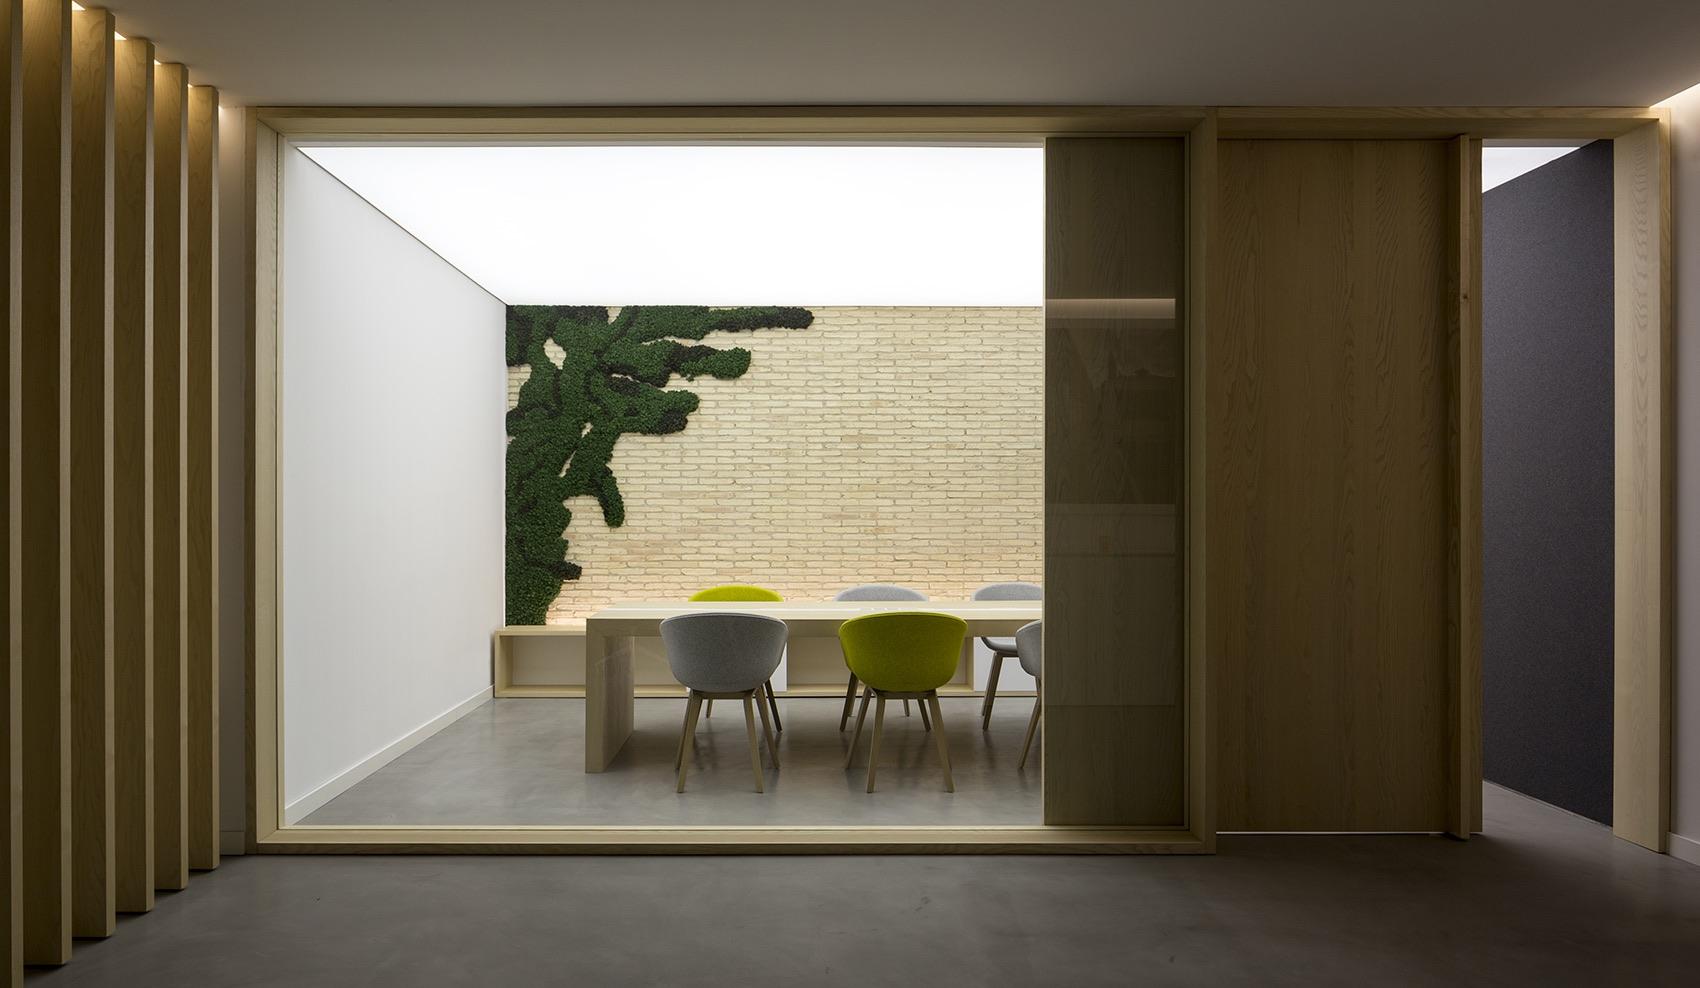 A Look Inside Nonna Design's Minimalist Valencia Office